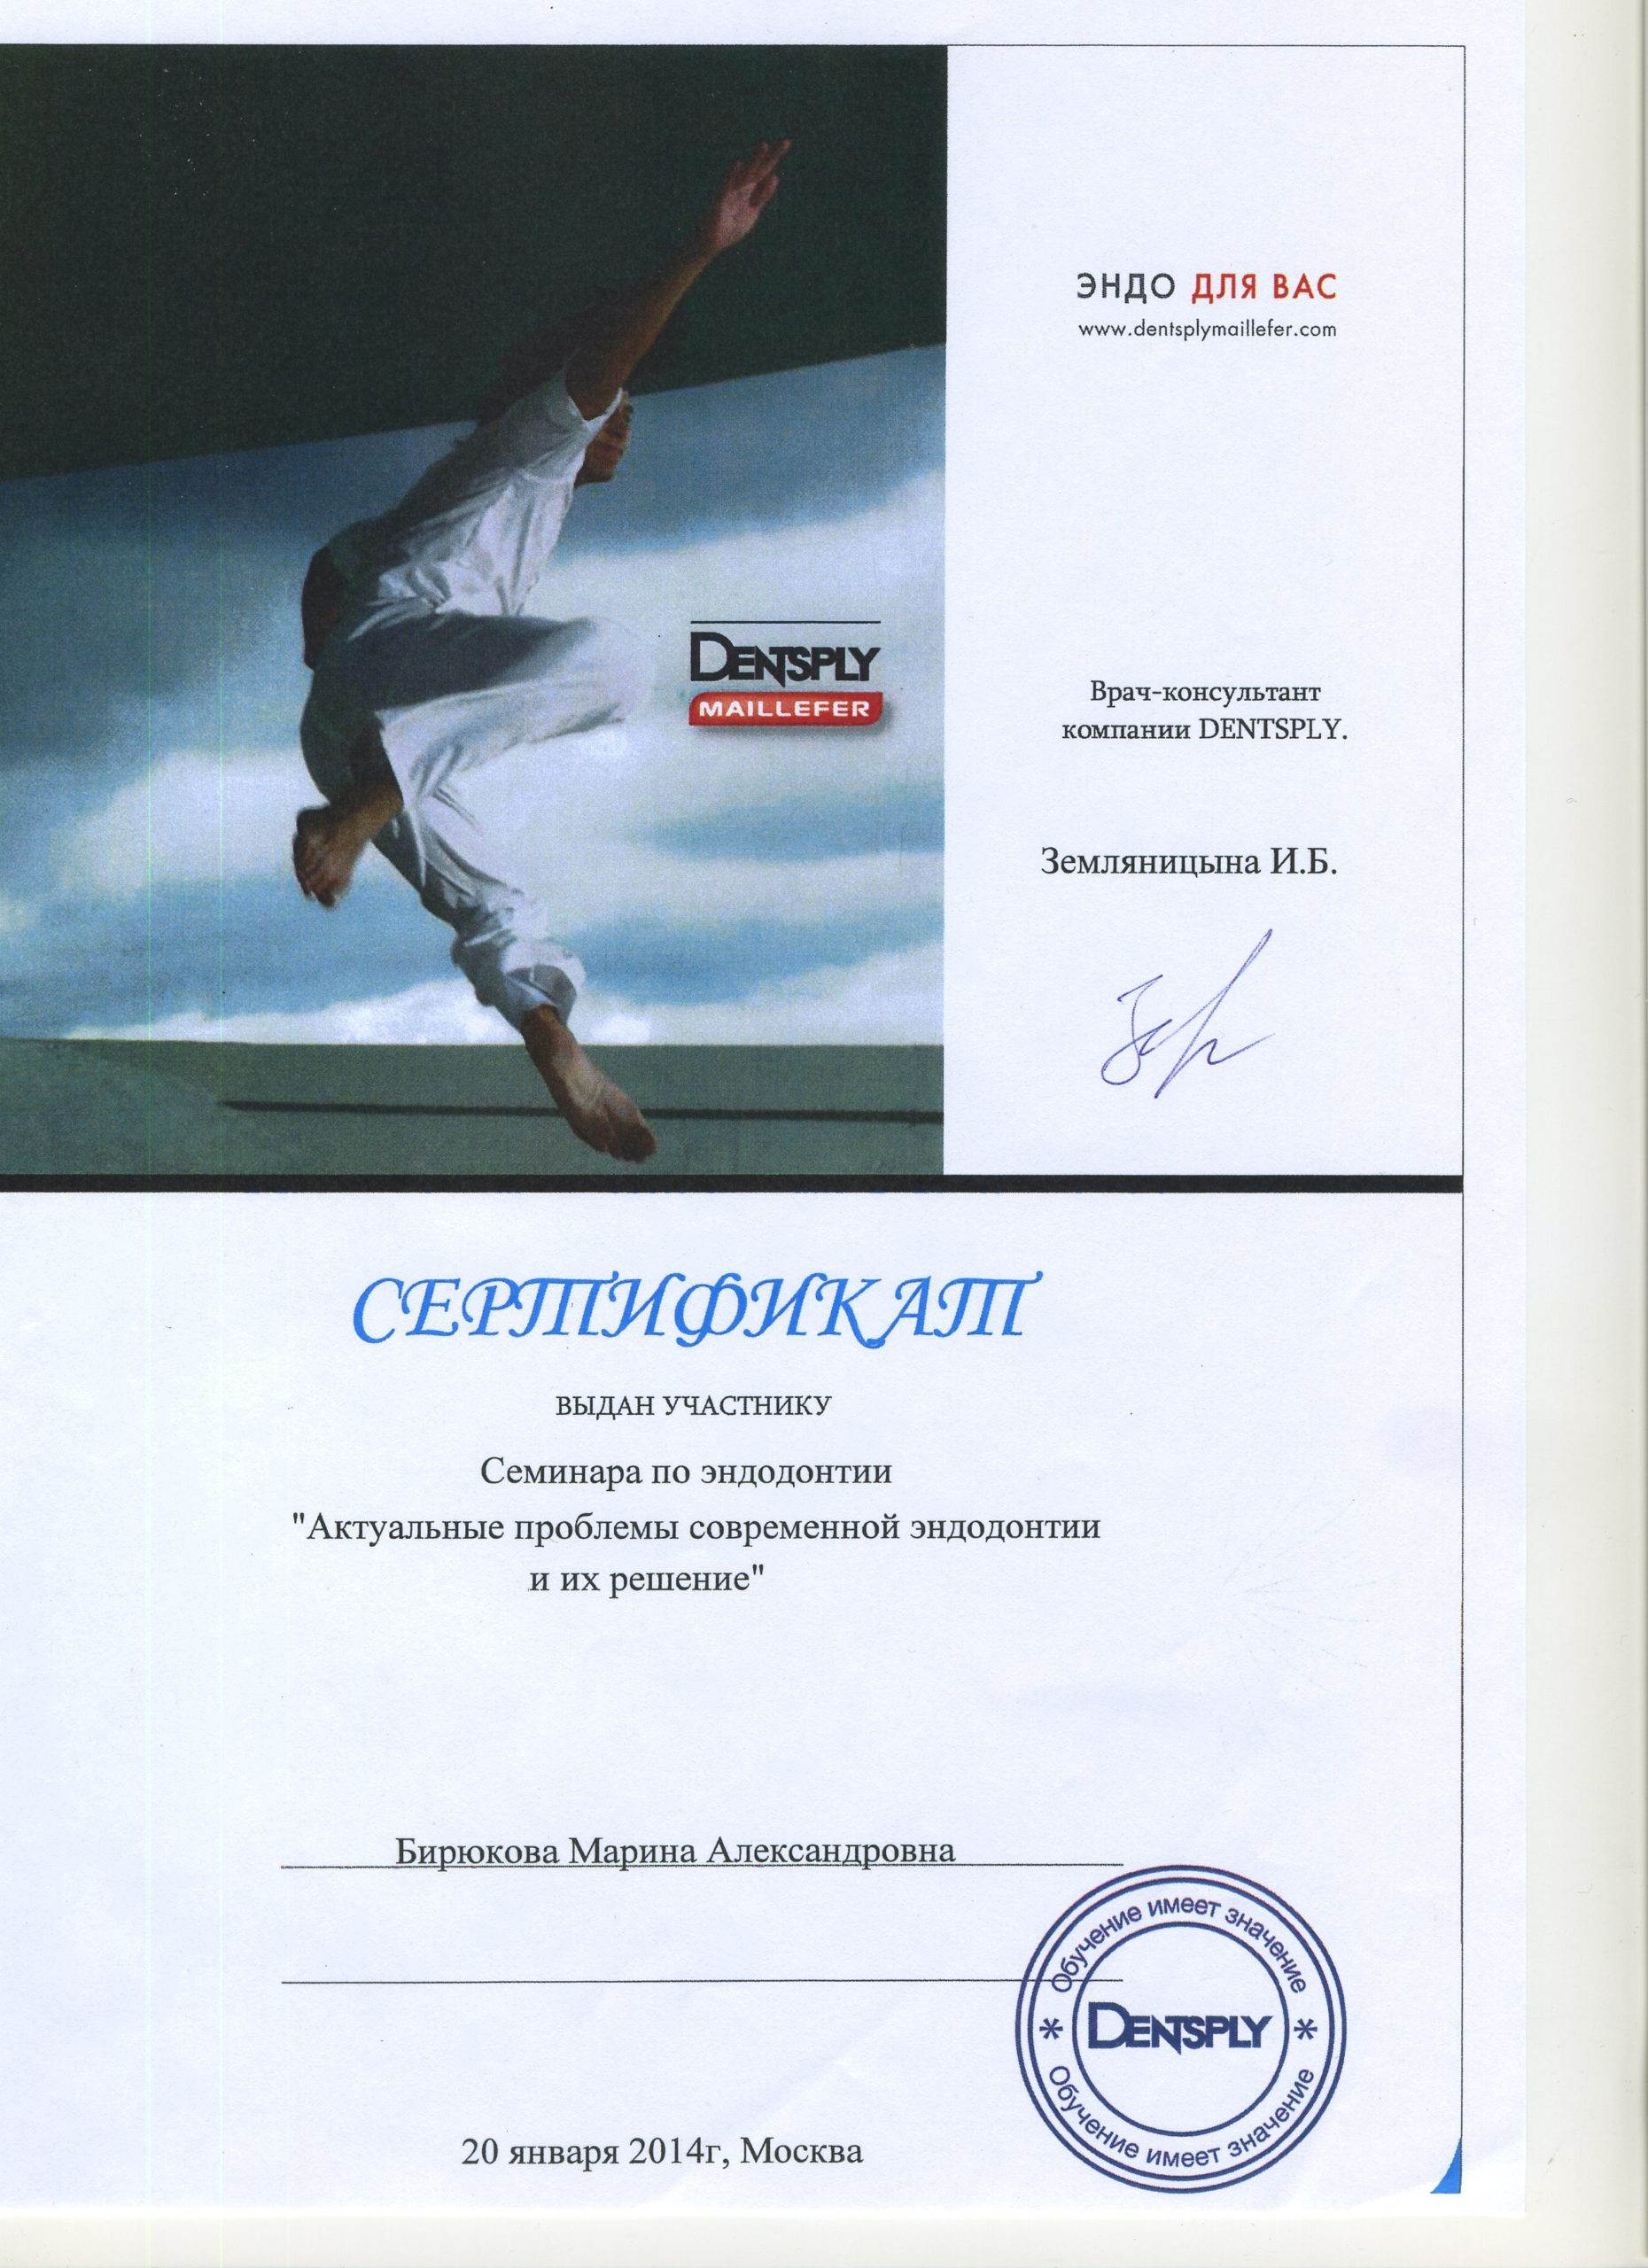 Сертифиат Жилеткова Марина Александровна_11